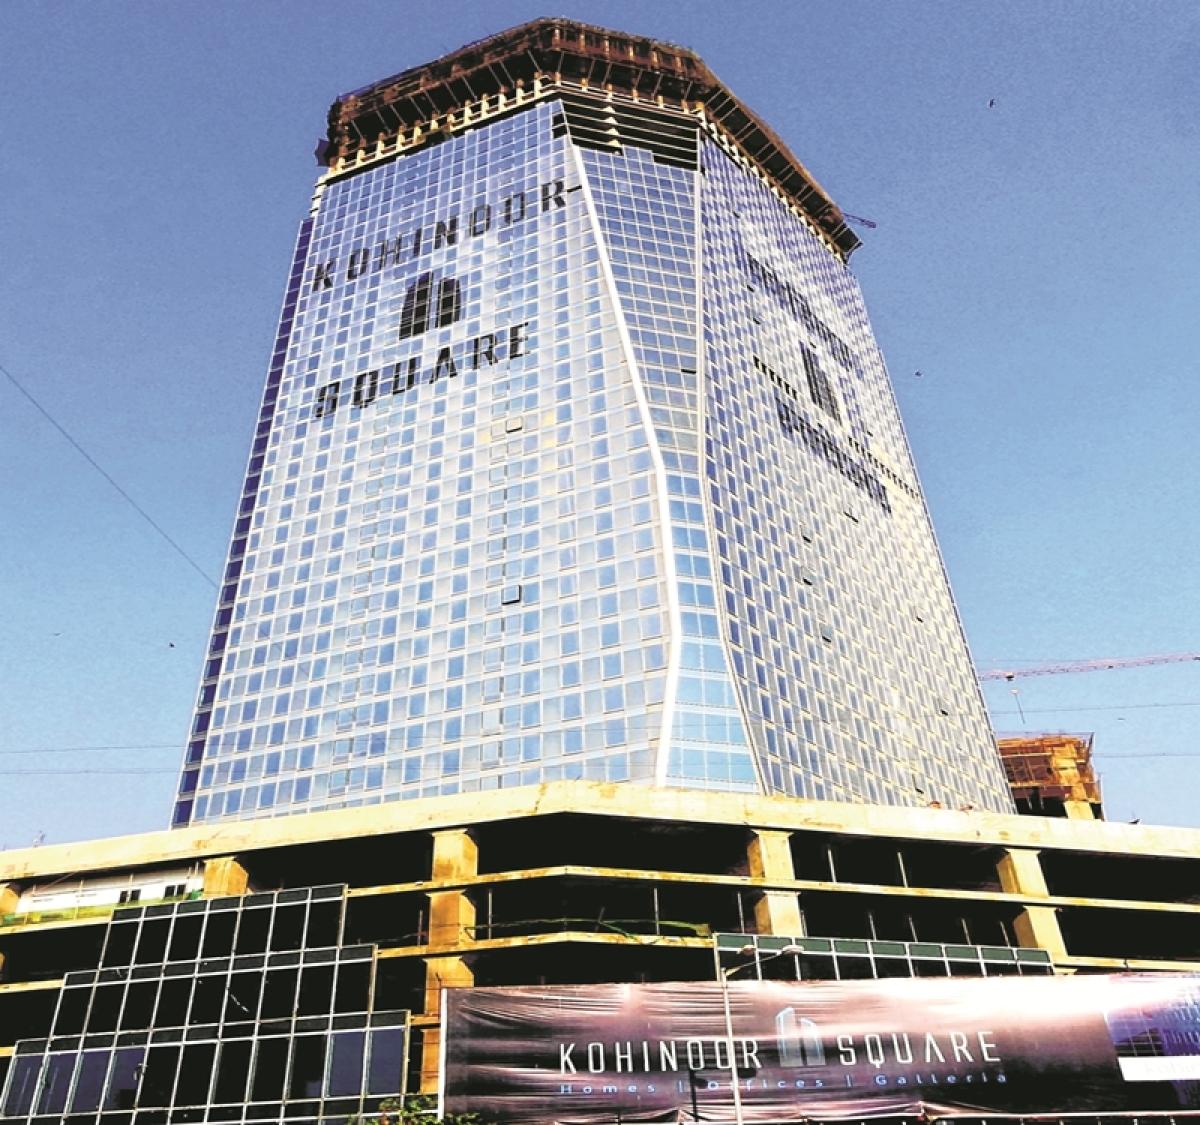 IL&FS gave loans immediately after suffering losses in 2008